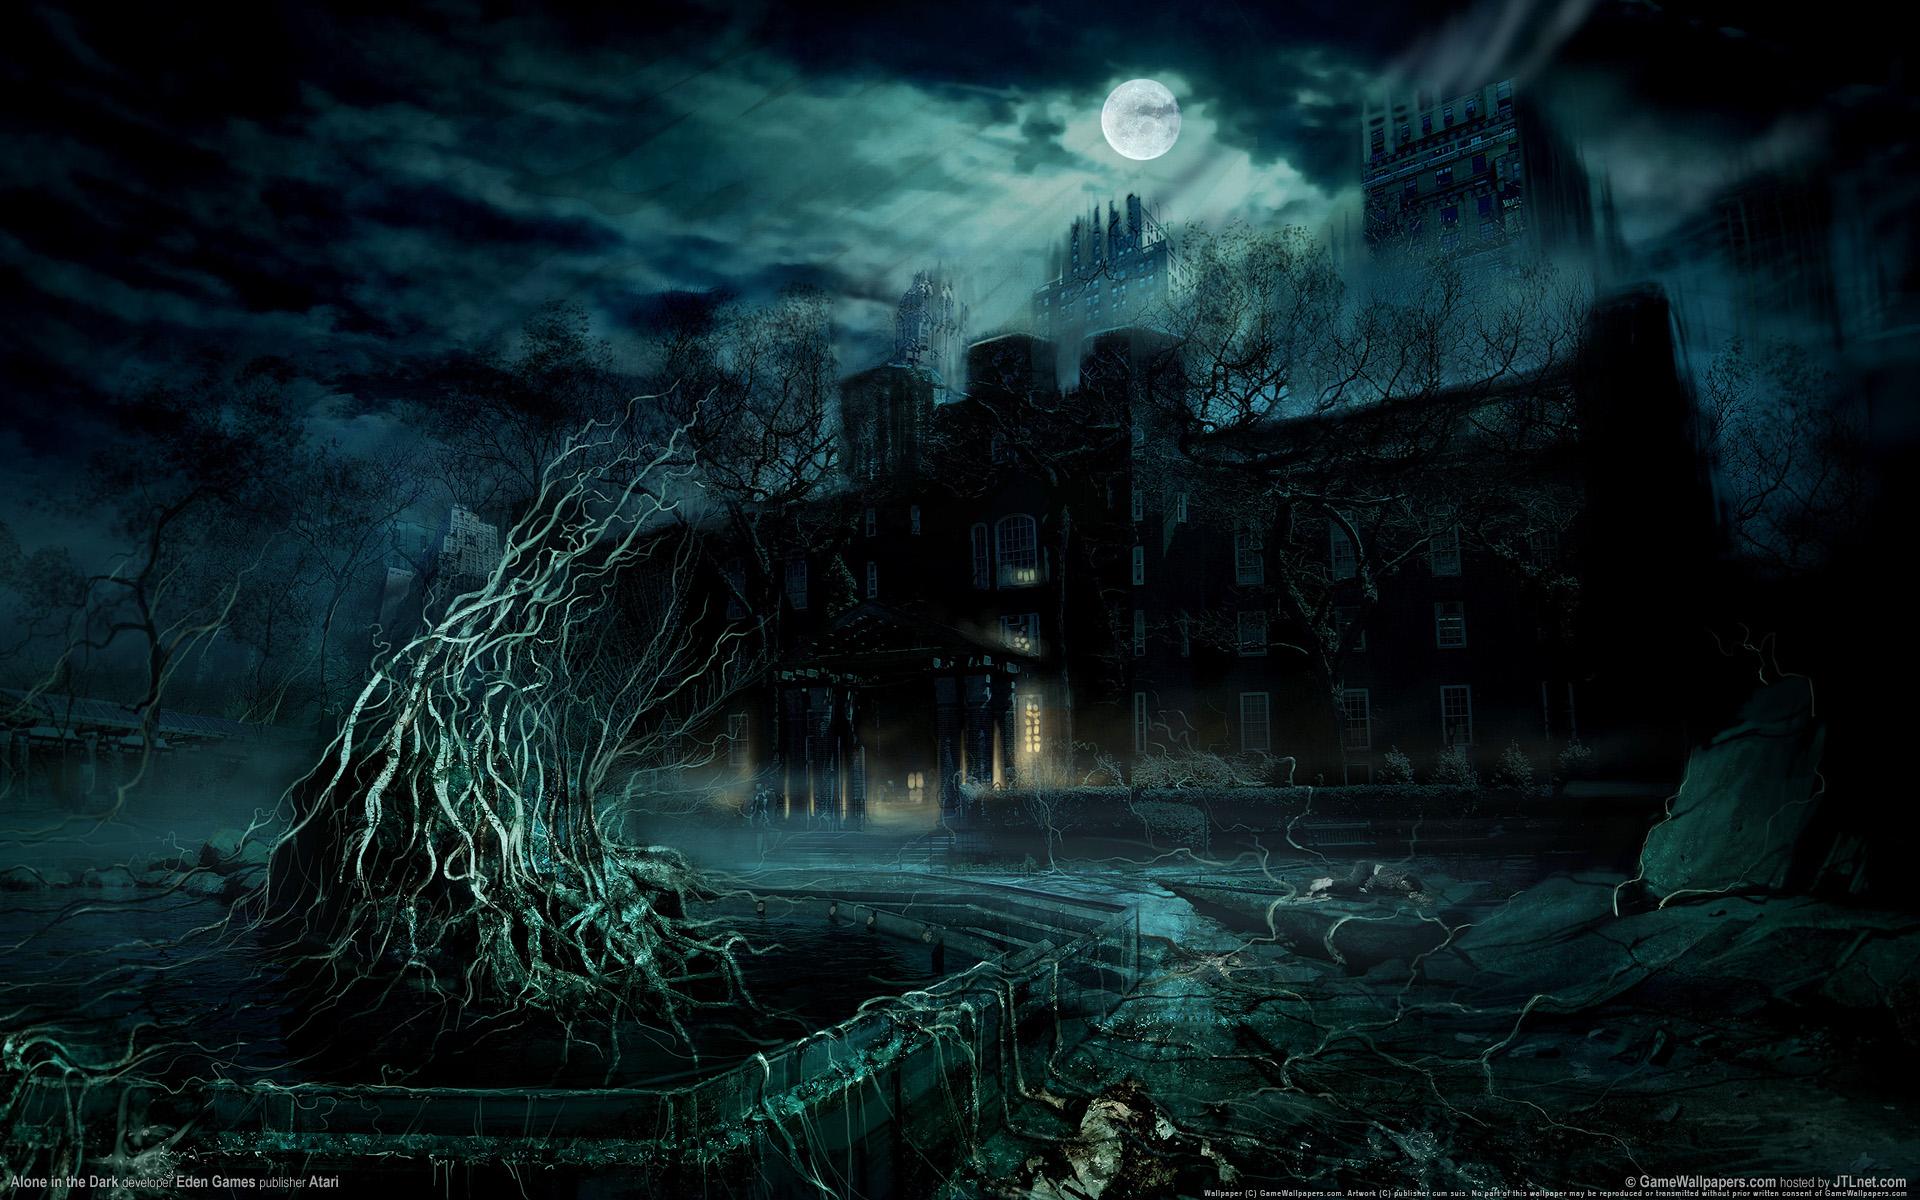 Free Download Dark City Night Wallpaper From Dark Wallpapers